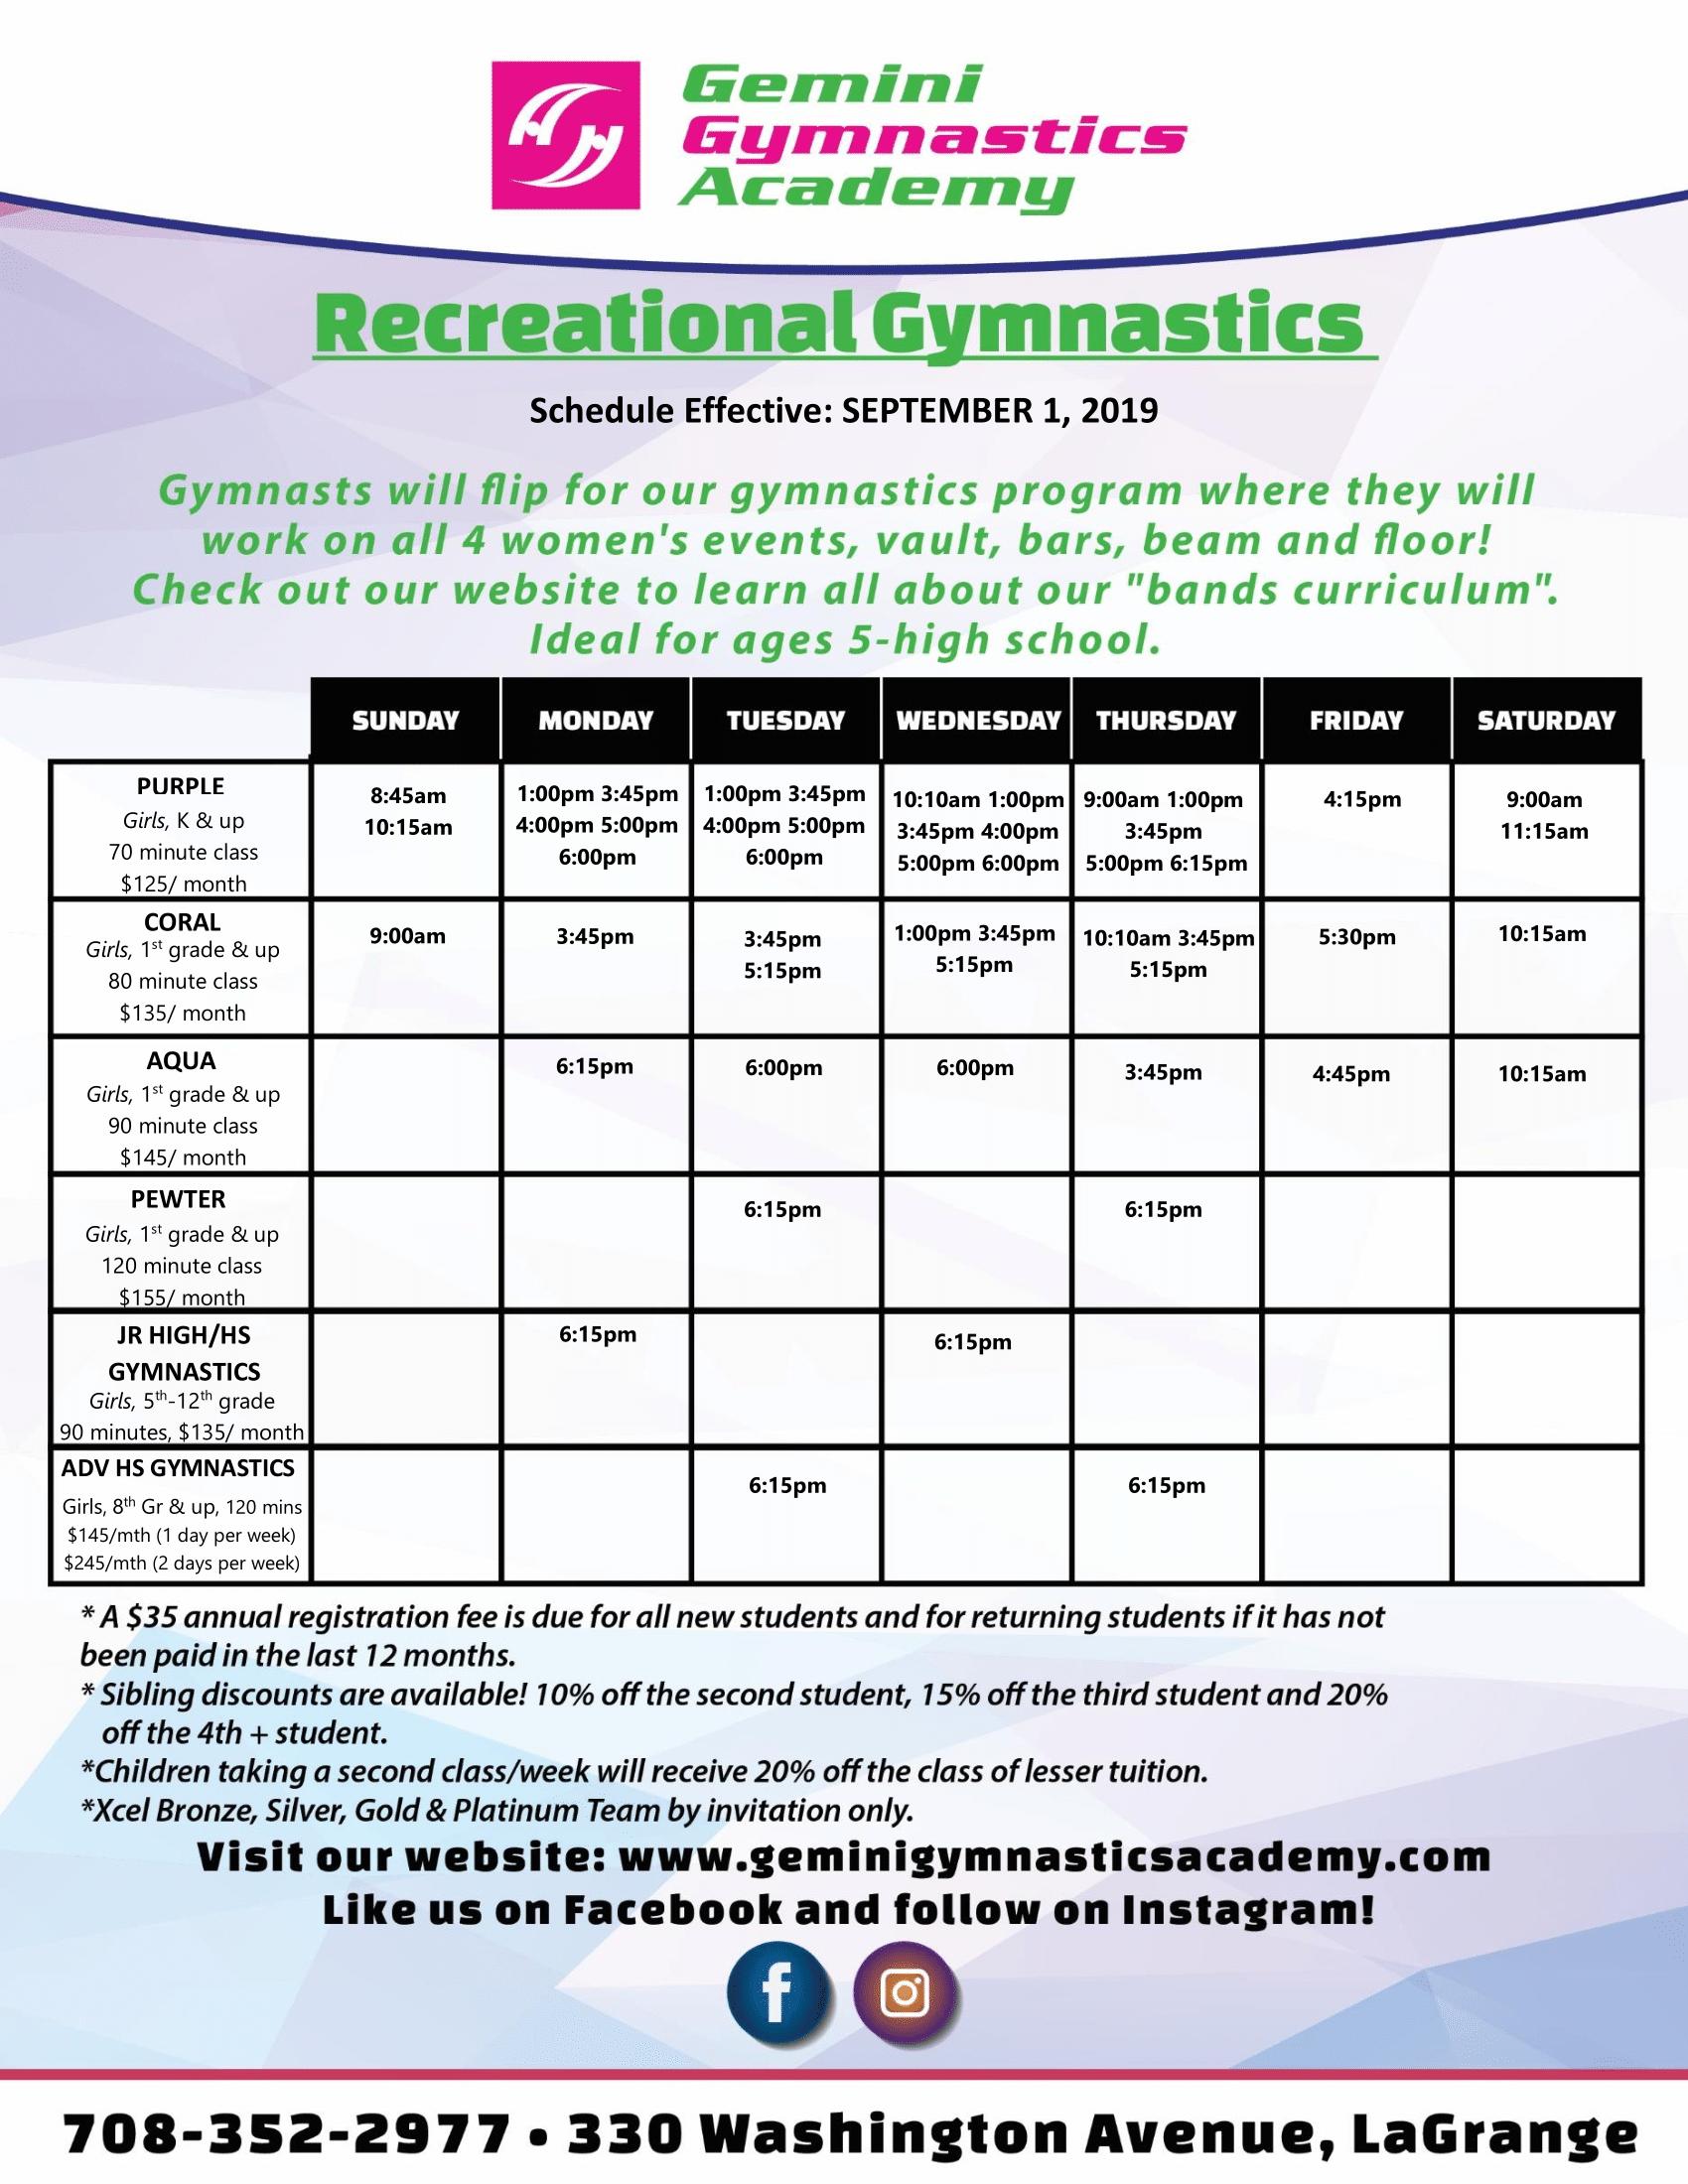 9_2019Gemini Gymnastics_Recreational Gymnastics_Schedule_-1